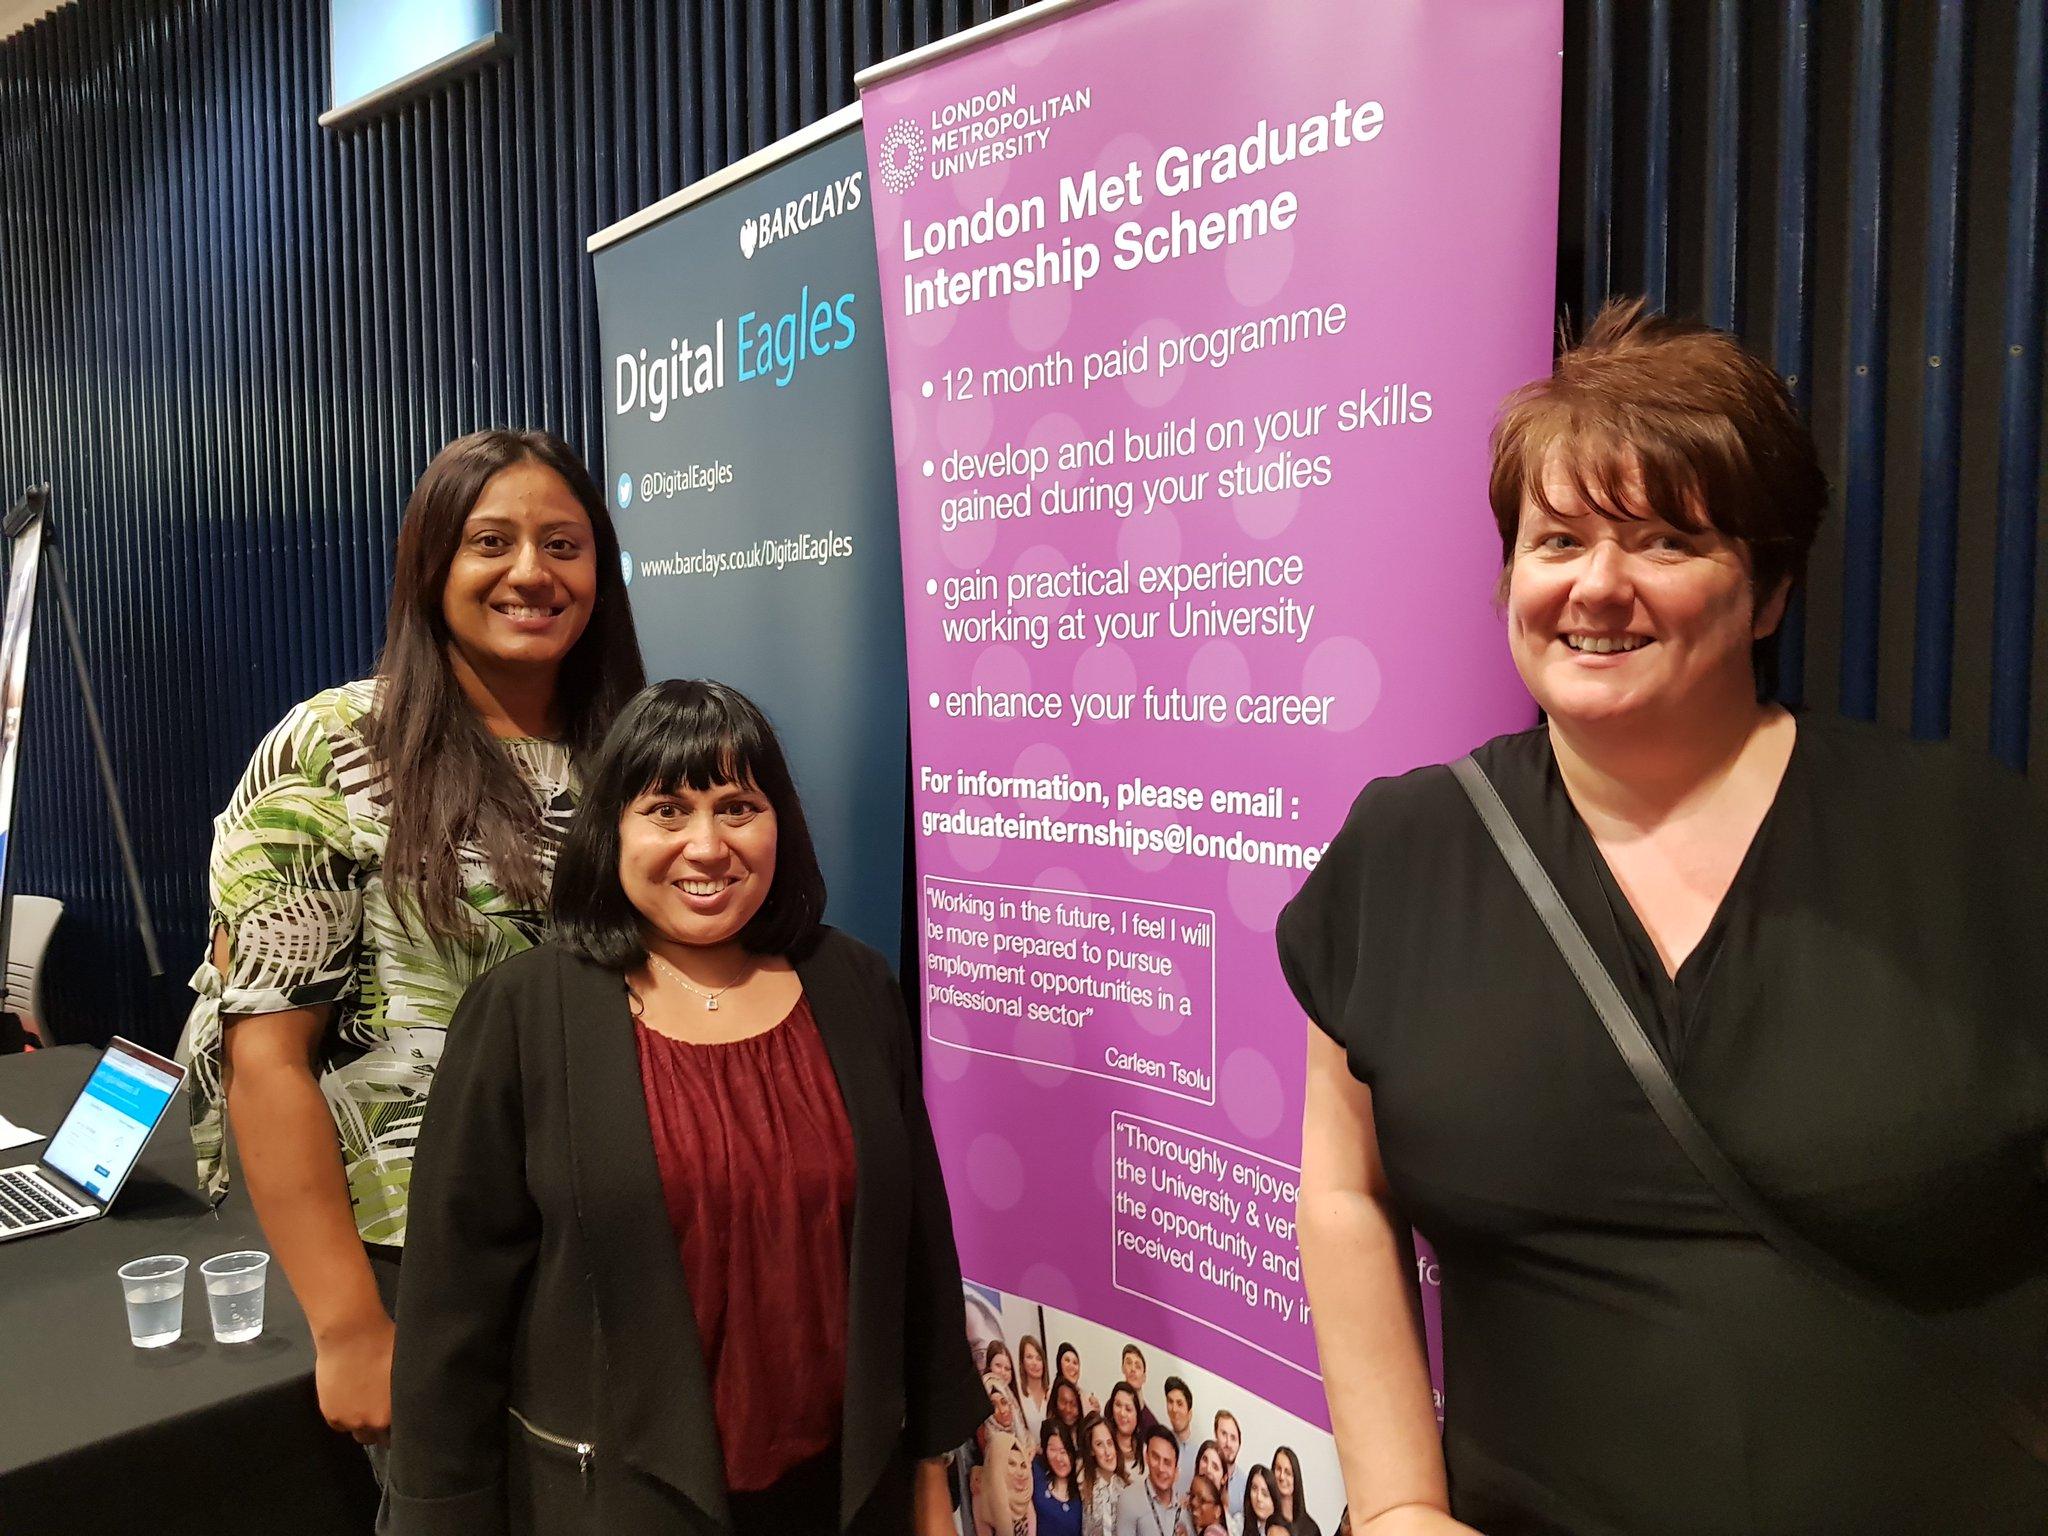 Fresh perspectives: graduate internship scheme 2018/19 london.